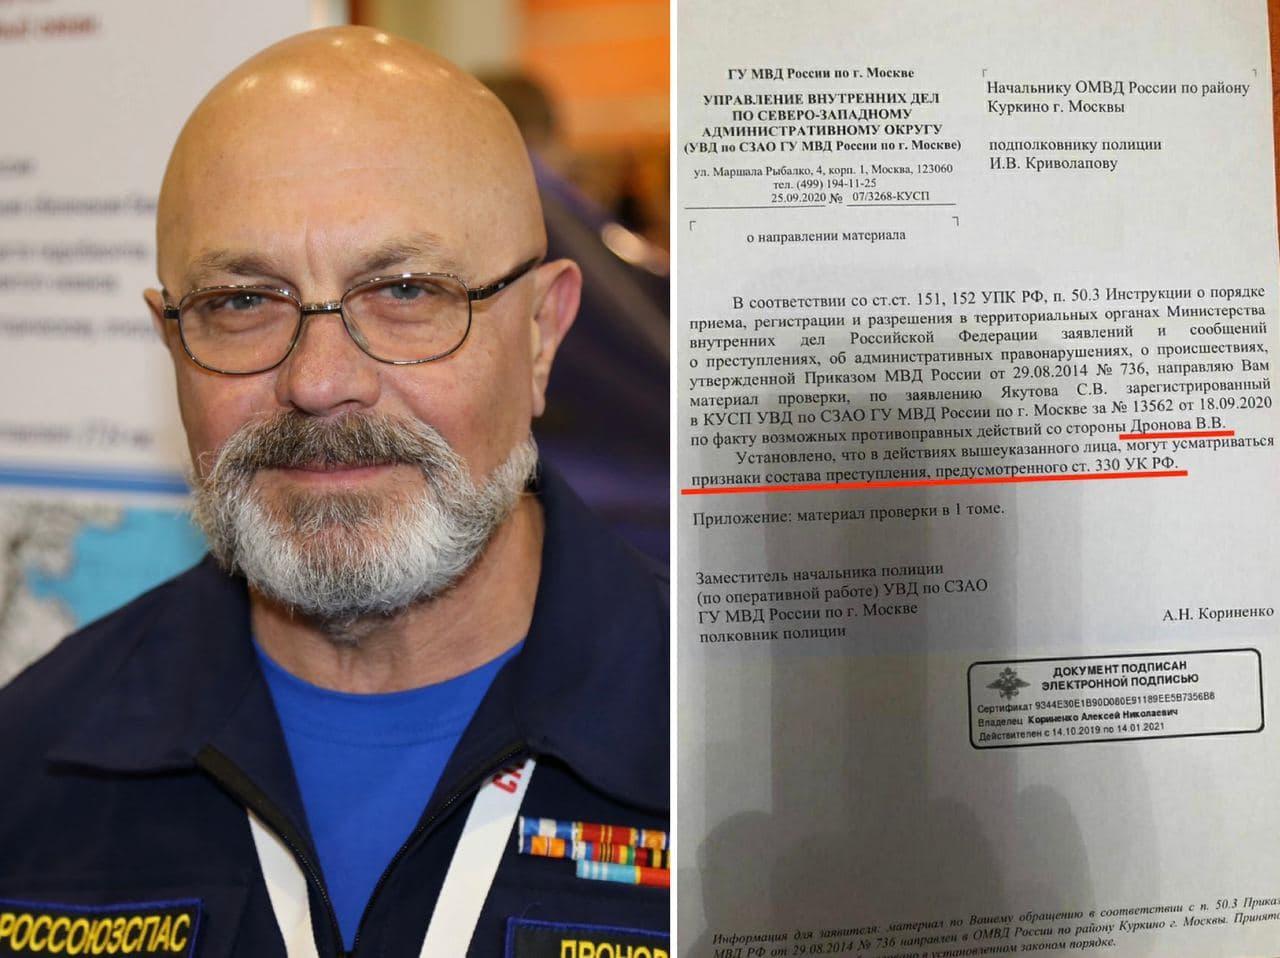 Валерий Дронов, Российский союз спасателей (РОССОЮЗСПАС)